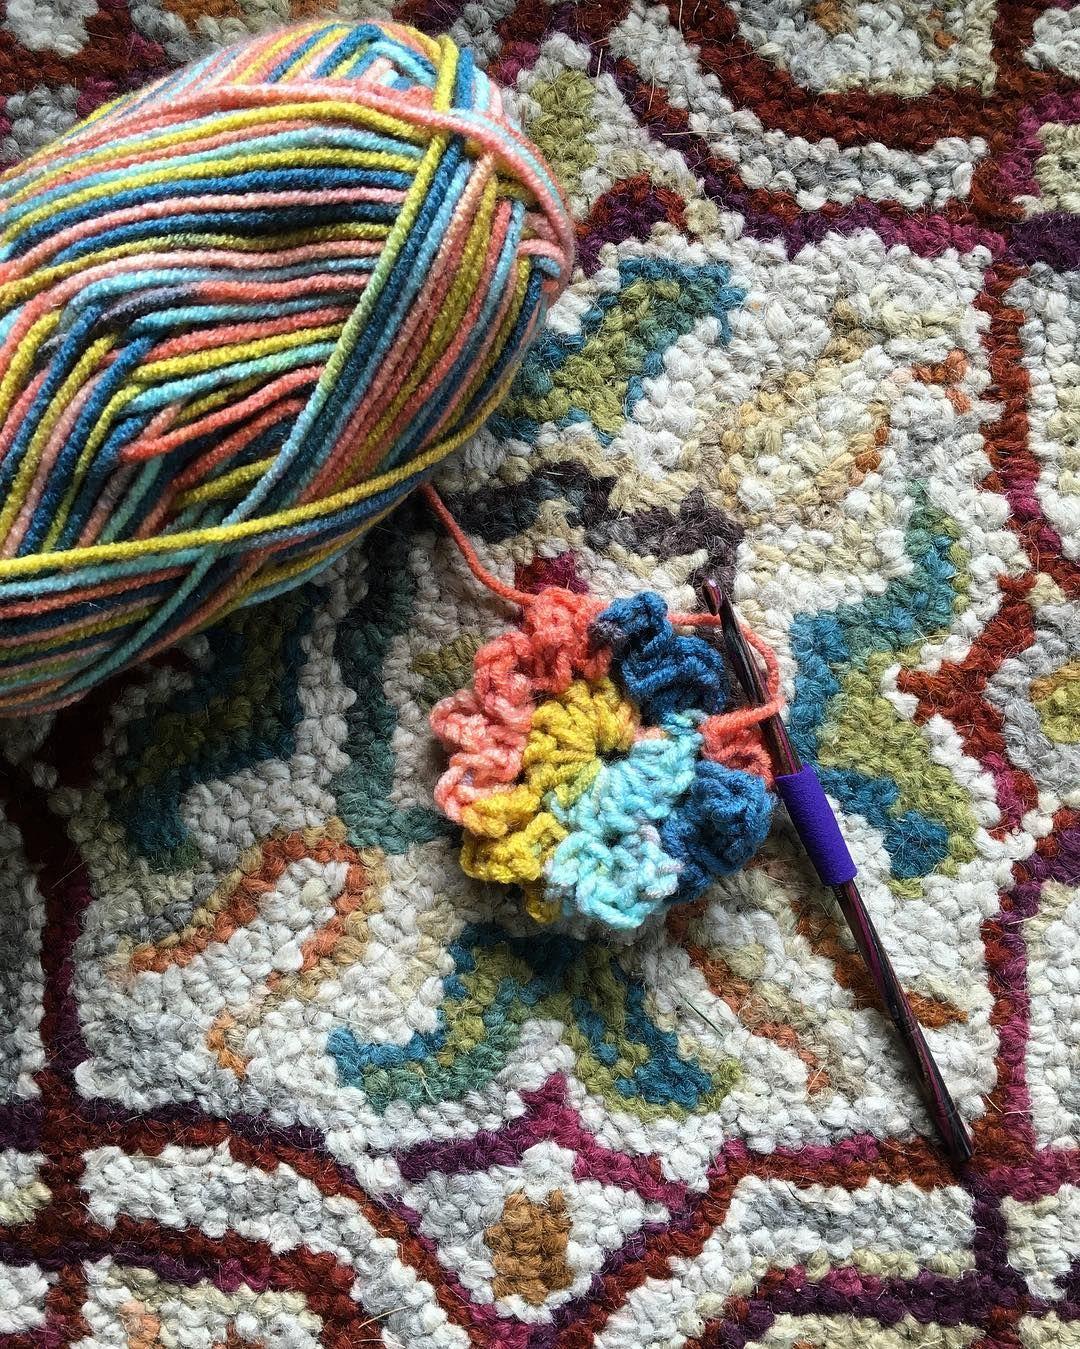 Big Twist Yarn Patterns Awesome Inspiration Ideas